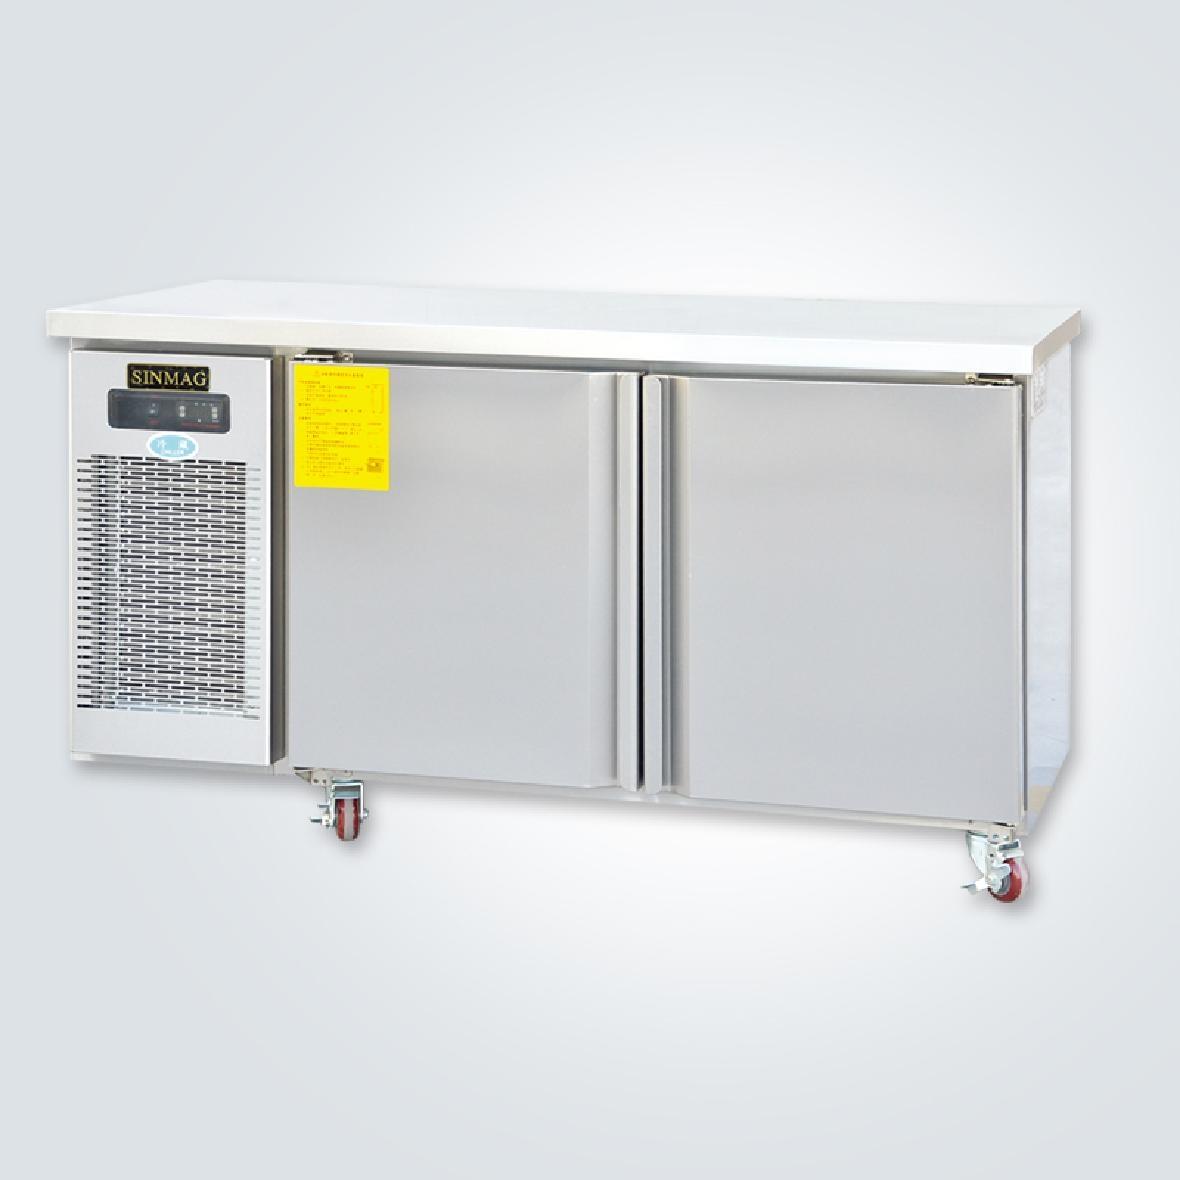 SCT-4W2-Z 二門網架式工作台